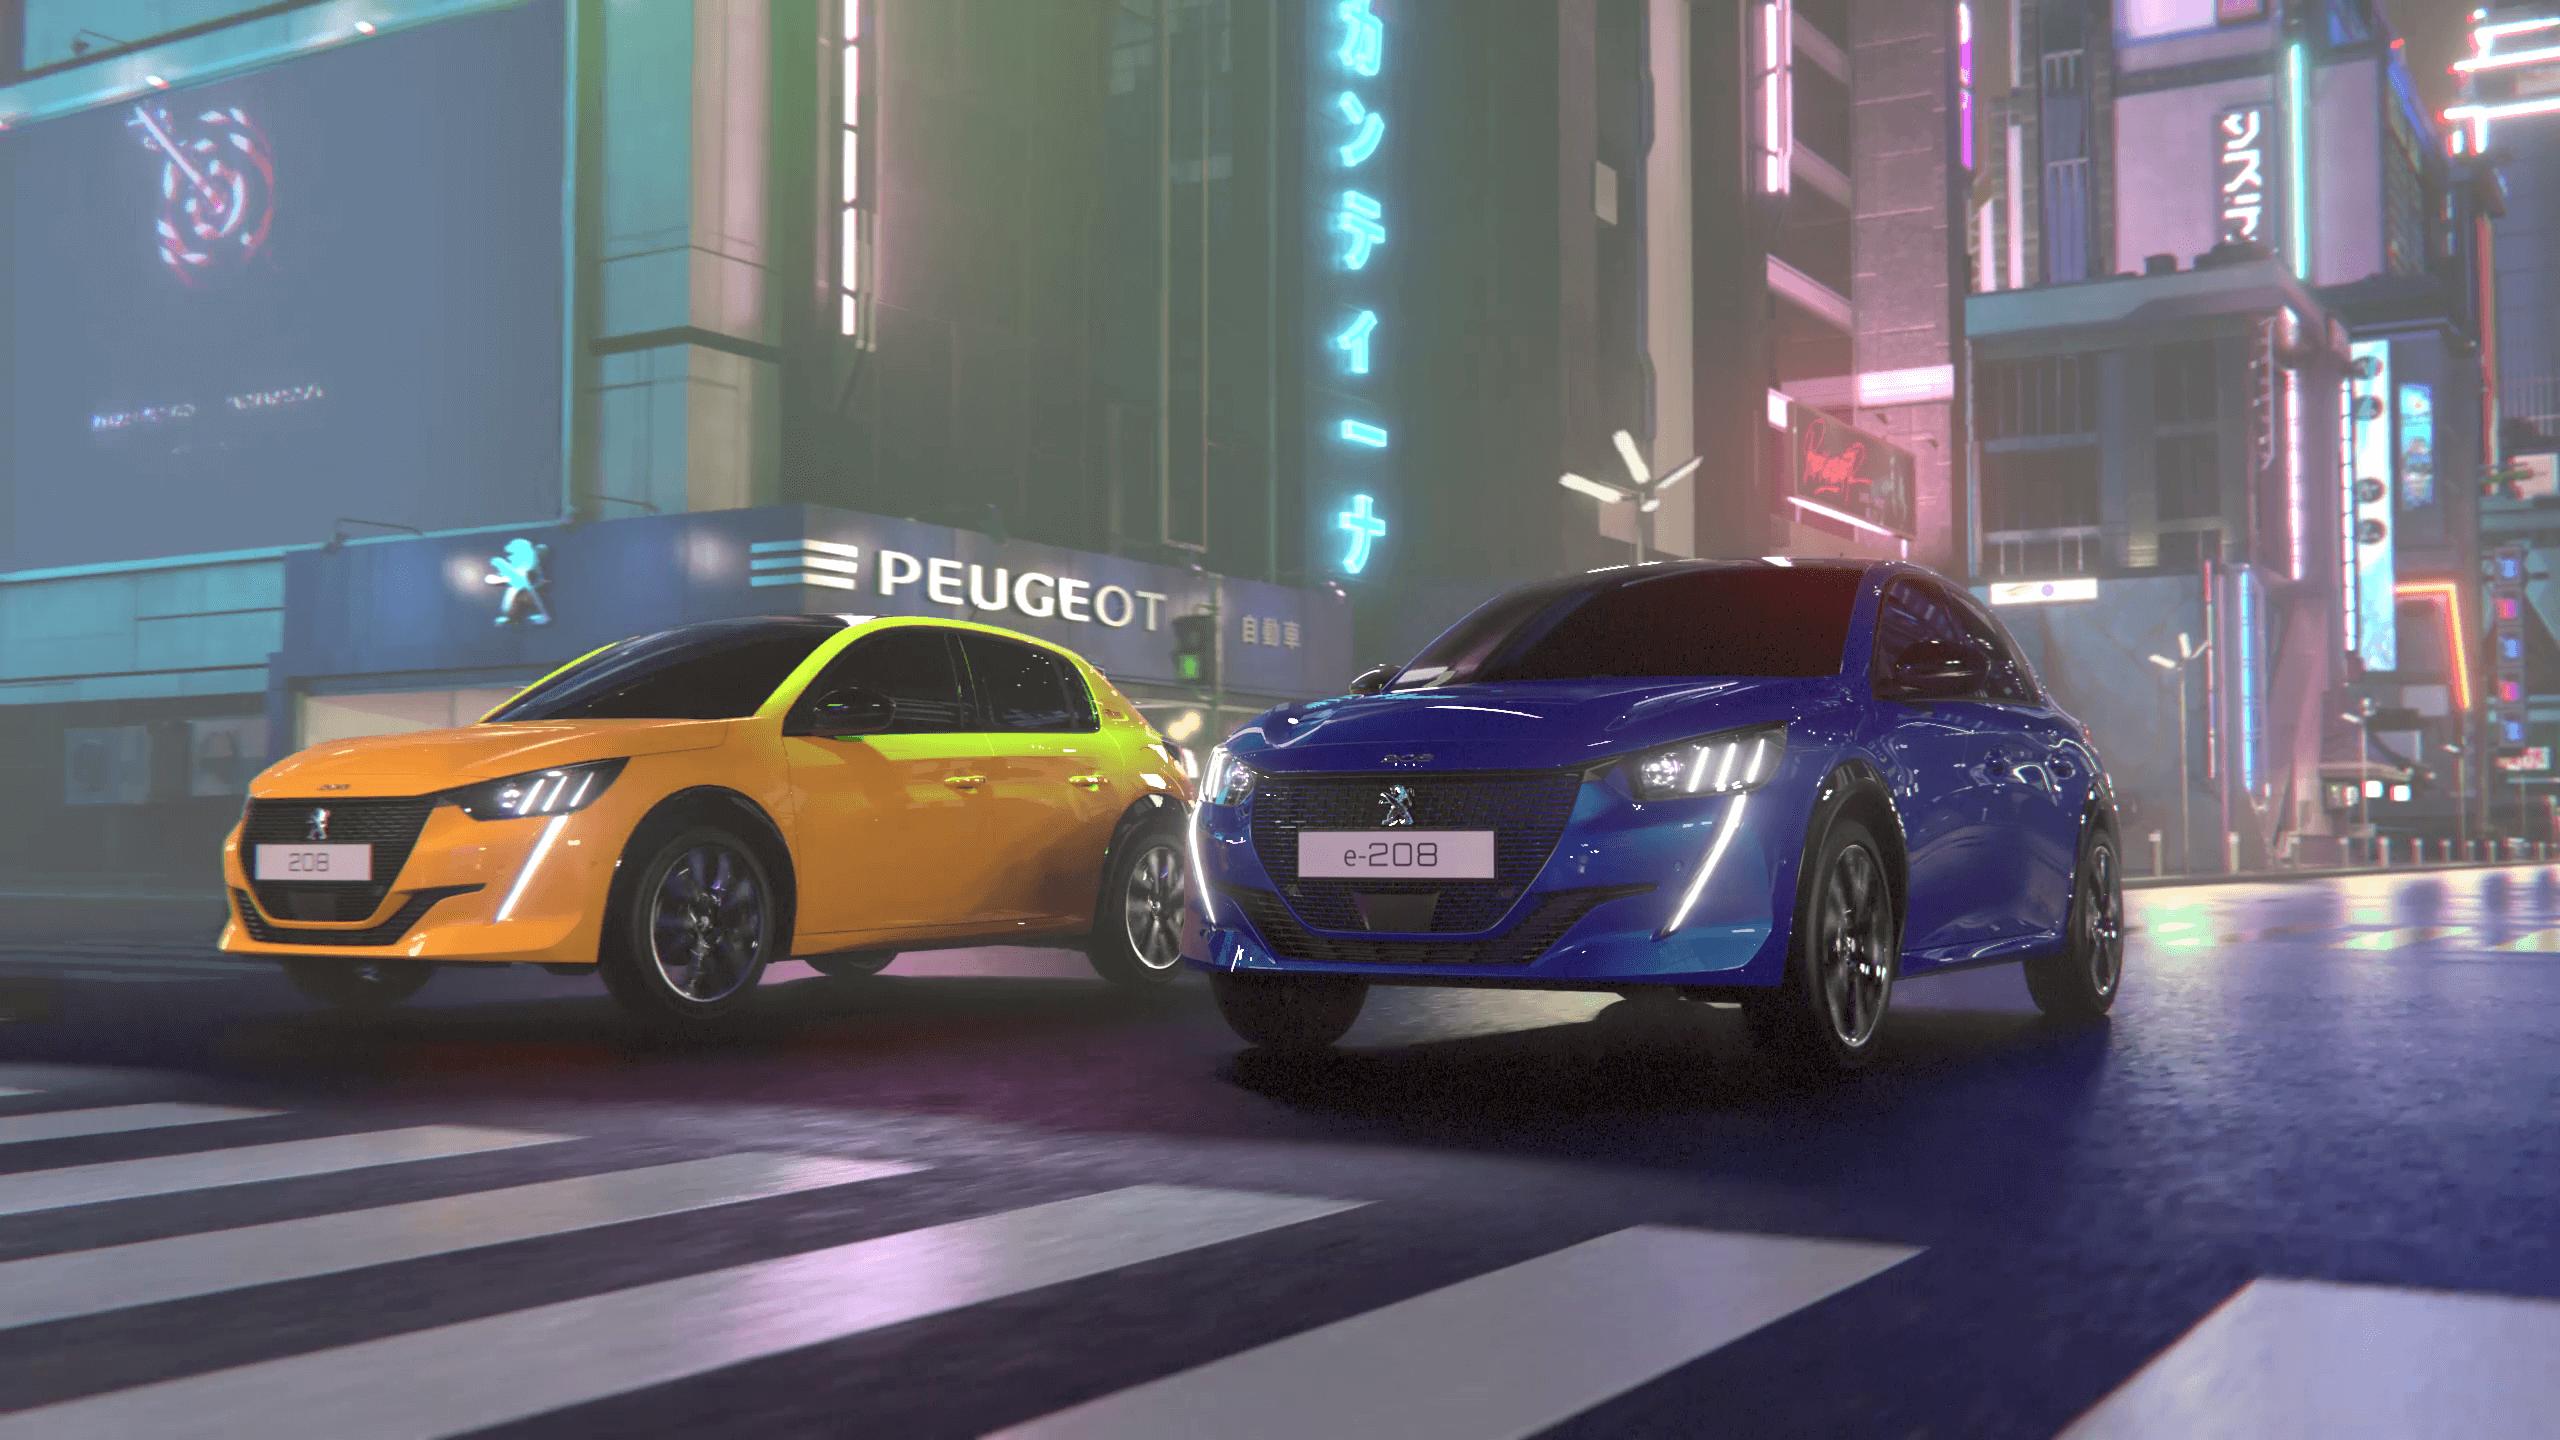 Peugeot-Tokyo-00008